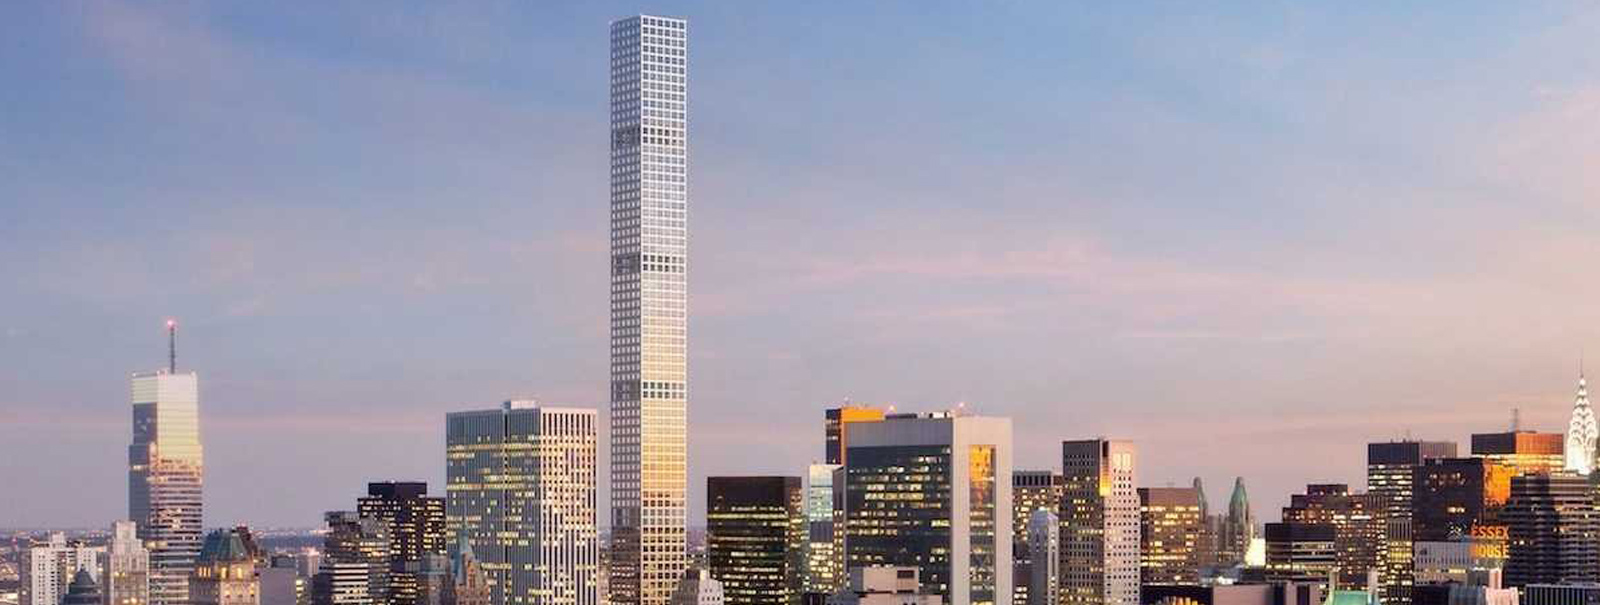 Il grattacielo pi alto d 39 occidente cond nast live for Appartamento grattacielo new york